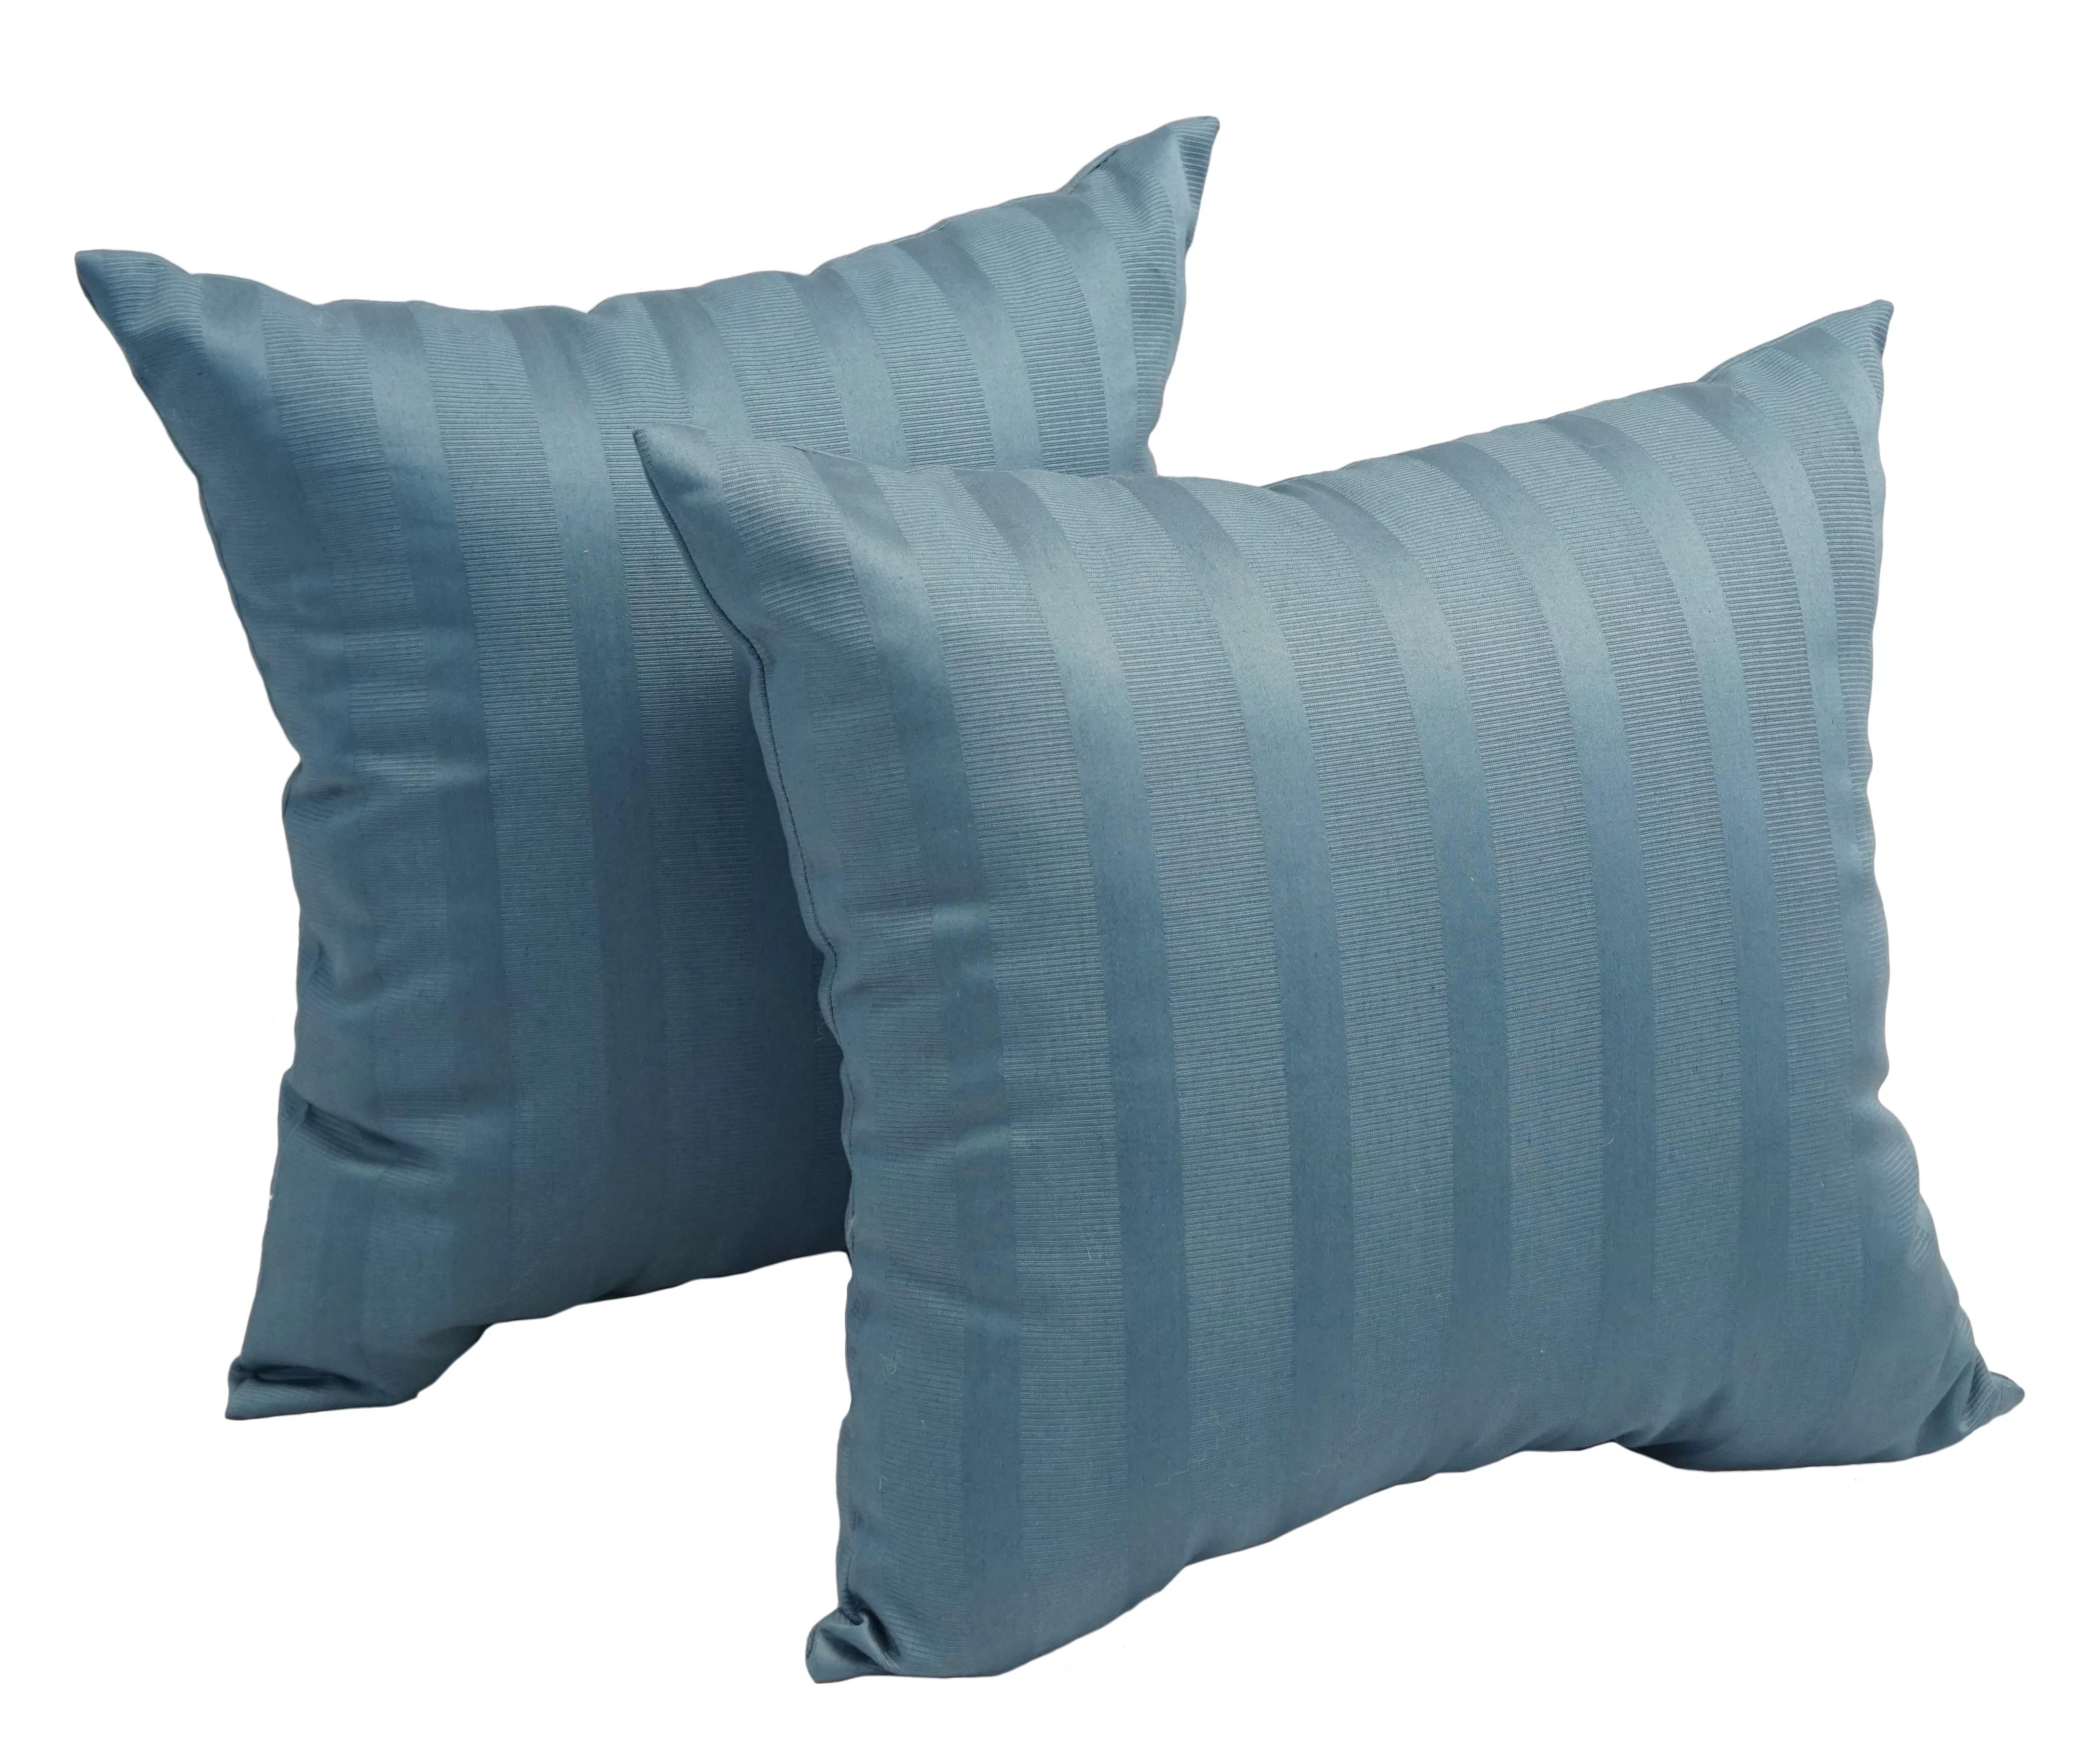 charlton home menlo shimmer ocean throw pillow reviews wayfair